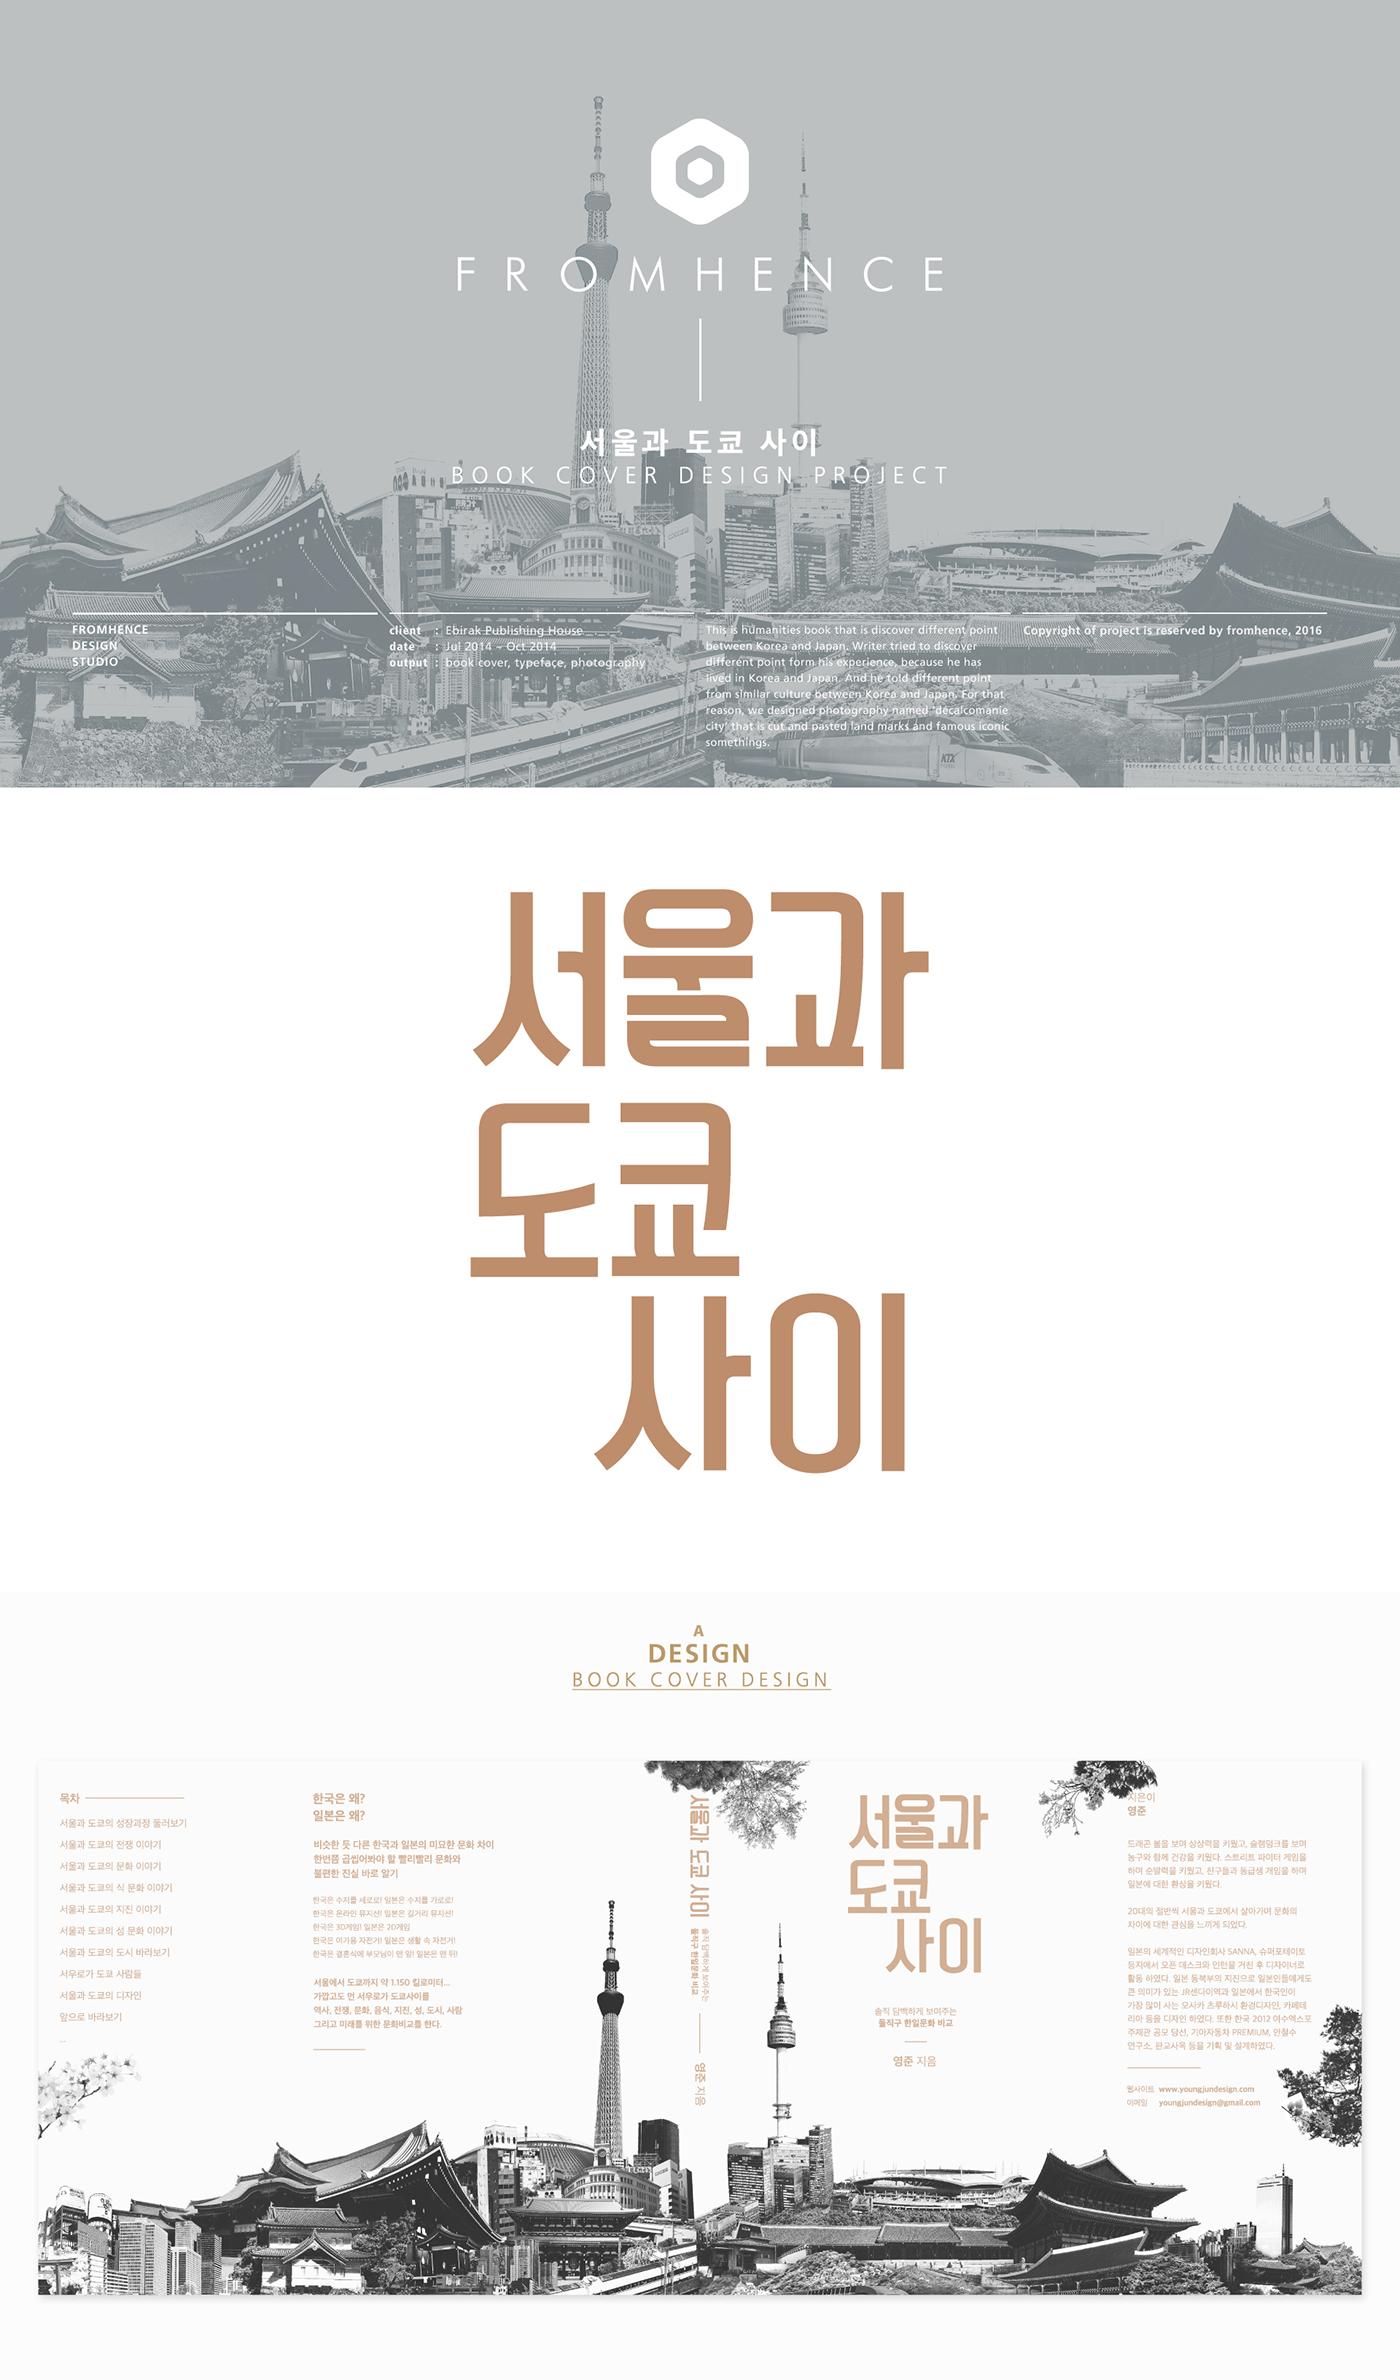 Korean Book Cover Design : Seoul between tokyo book cover design on behance